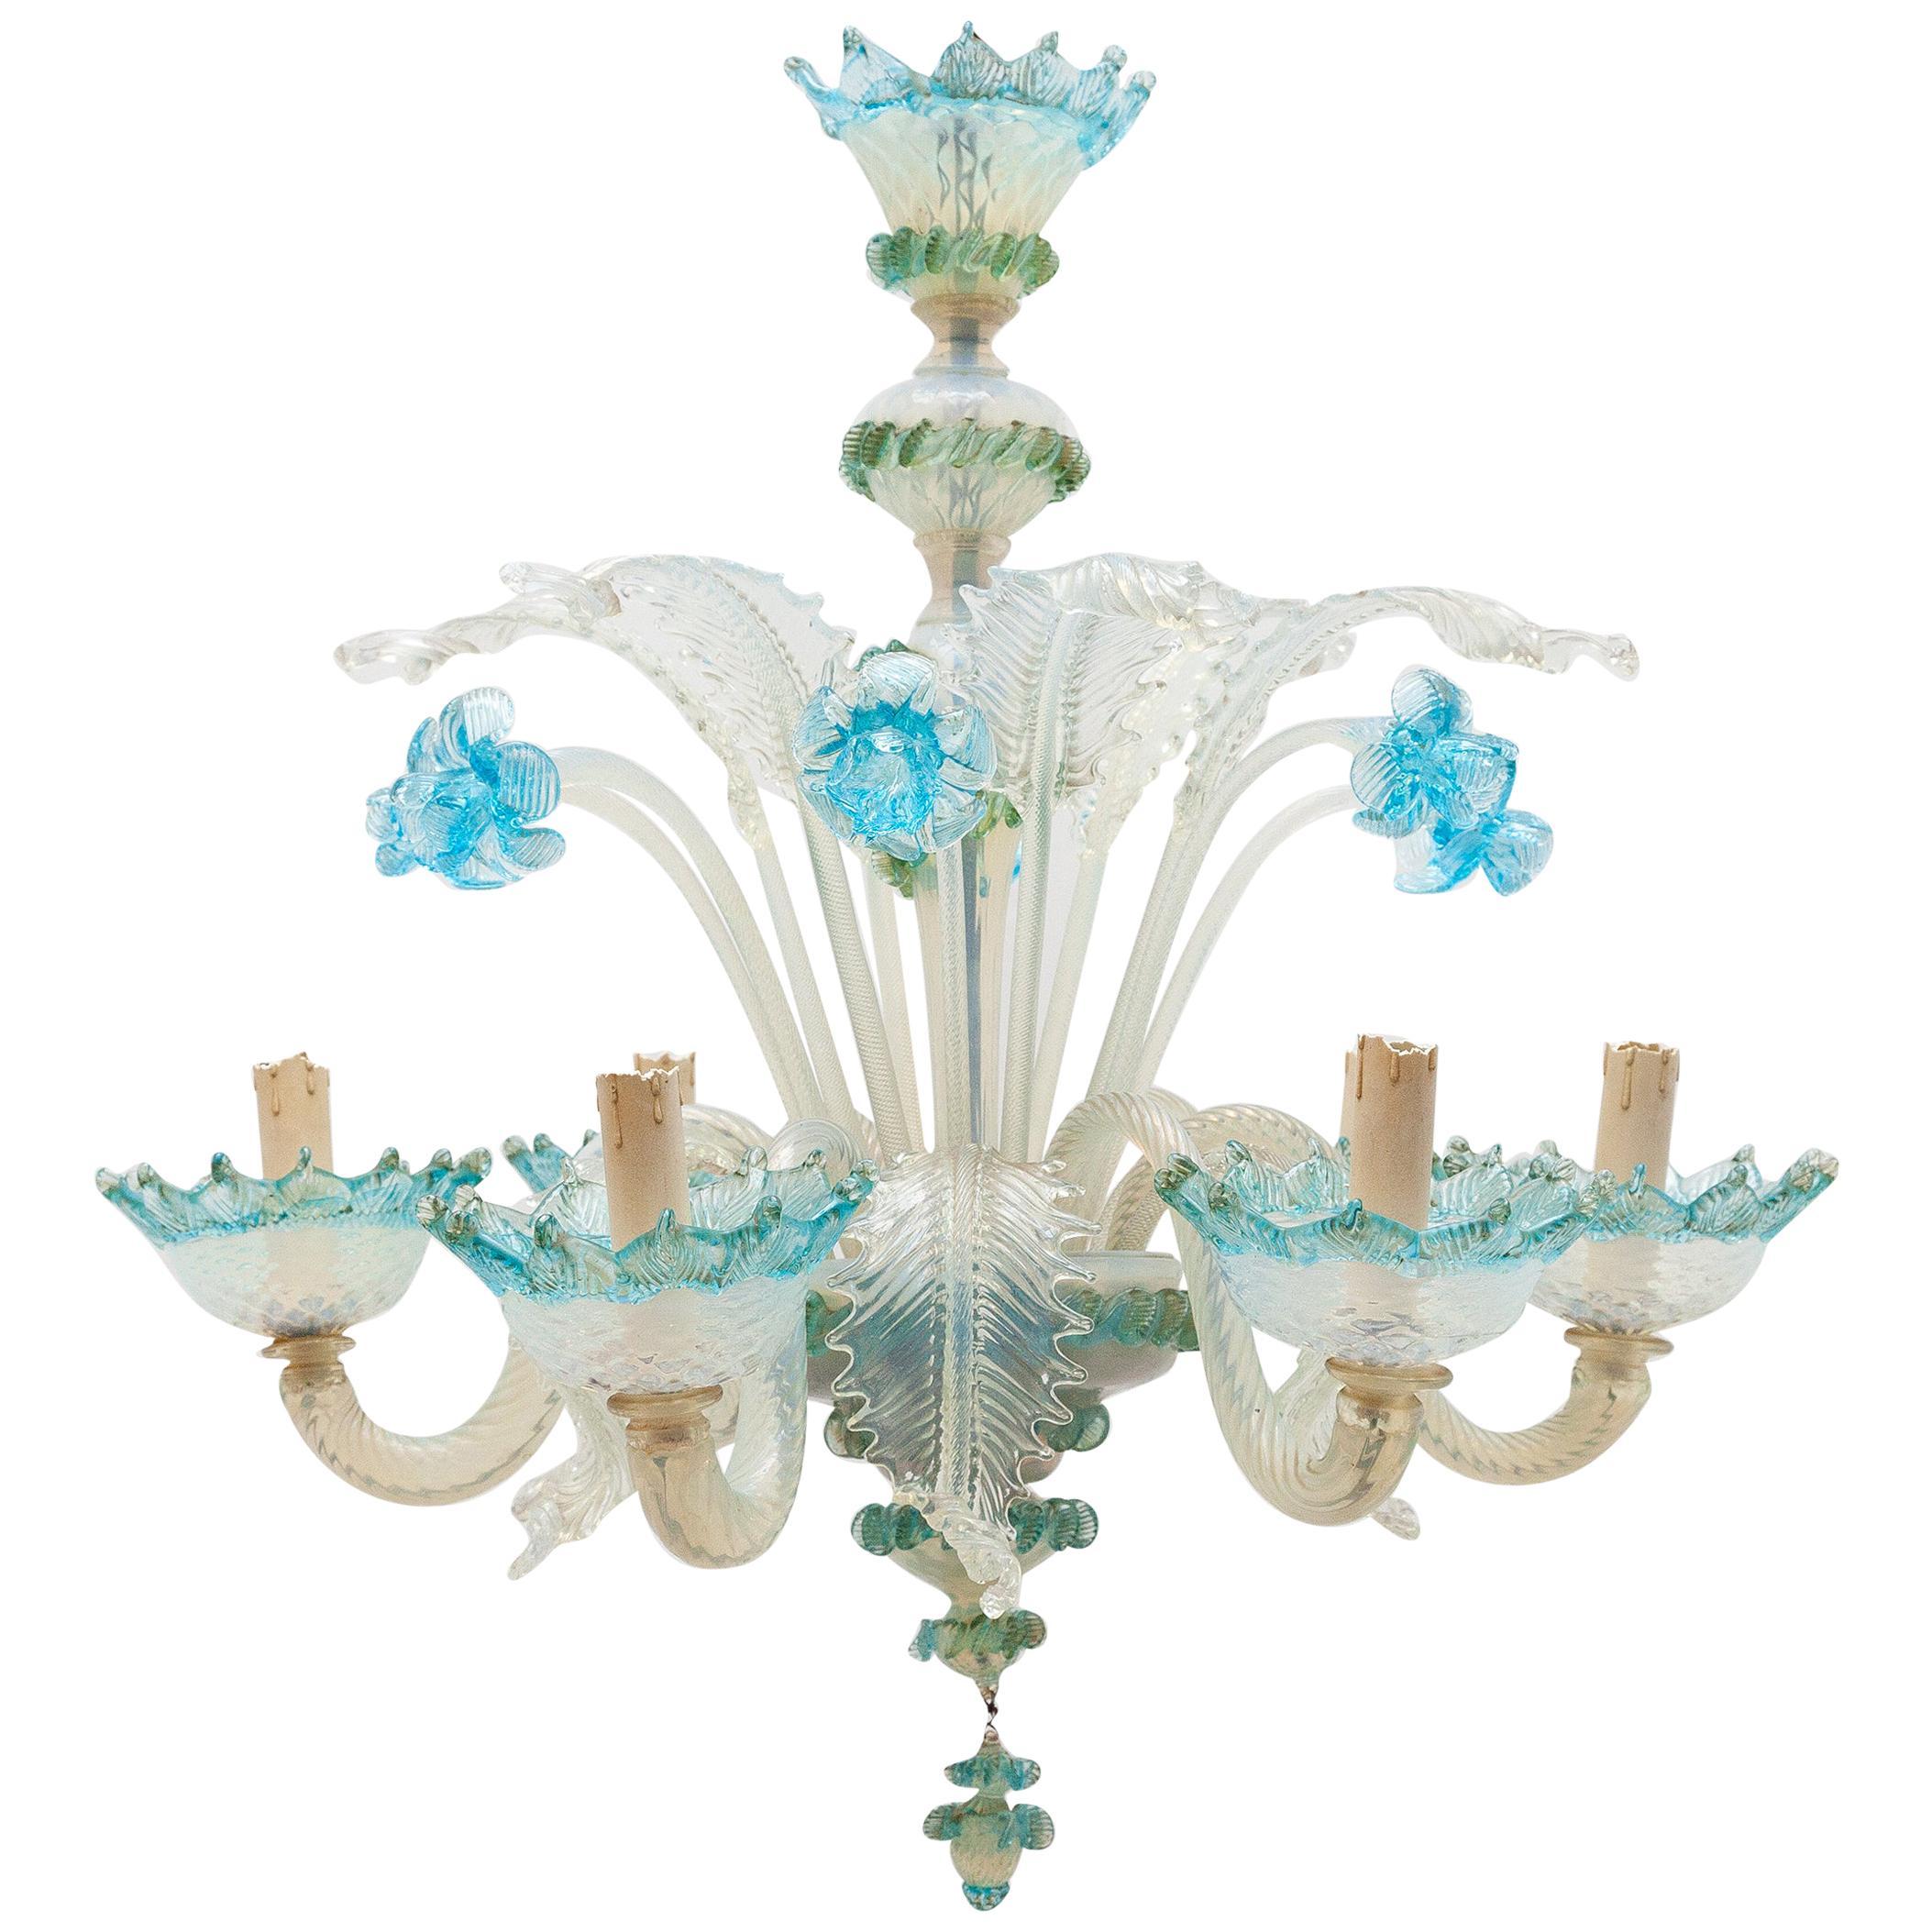 Romantic Murano Blue Opal Glass Chandelier, 1950s, Italy